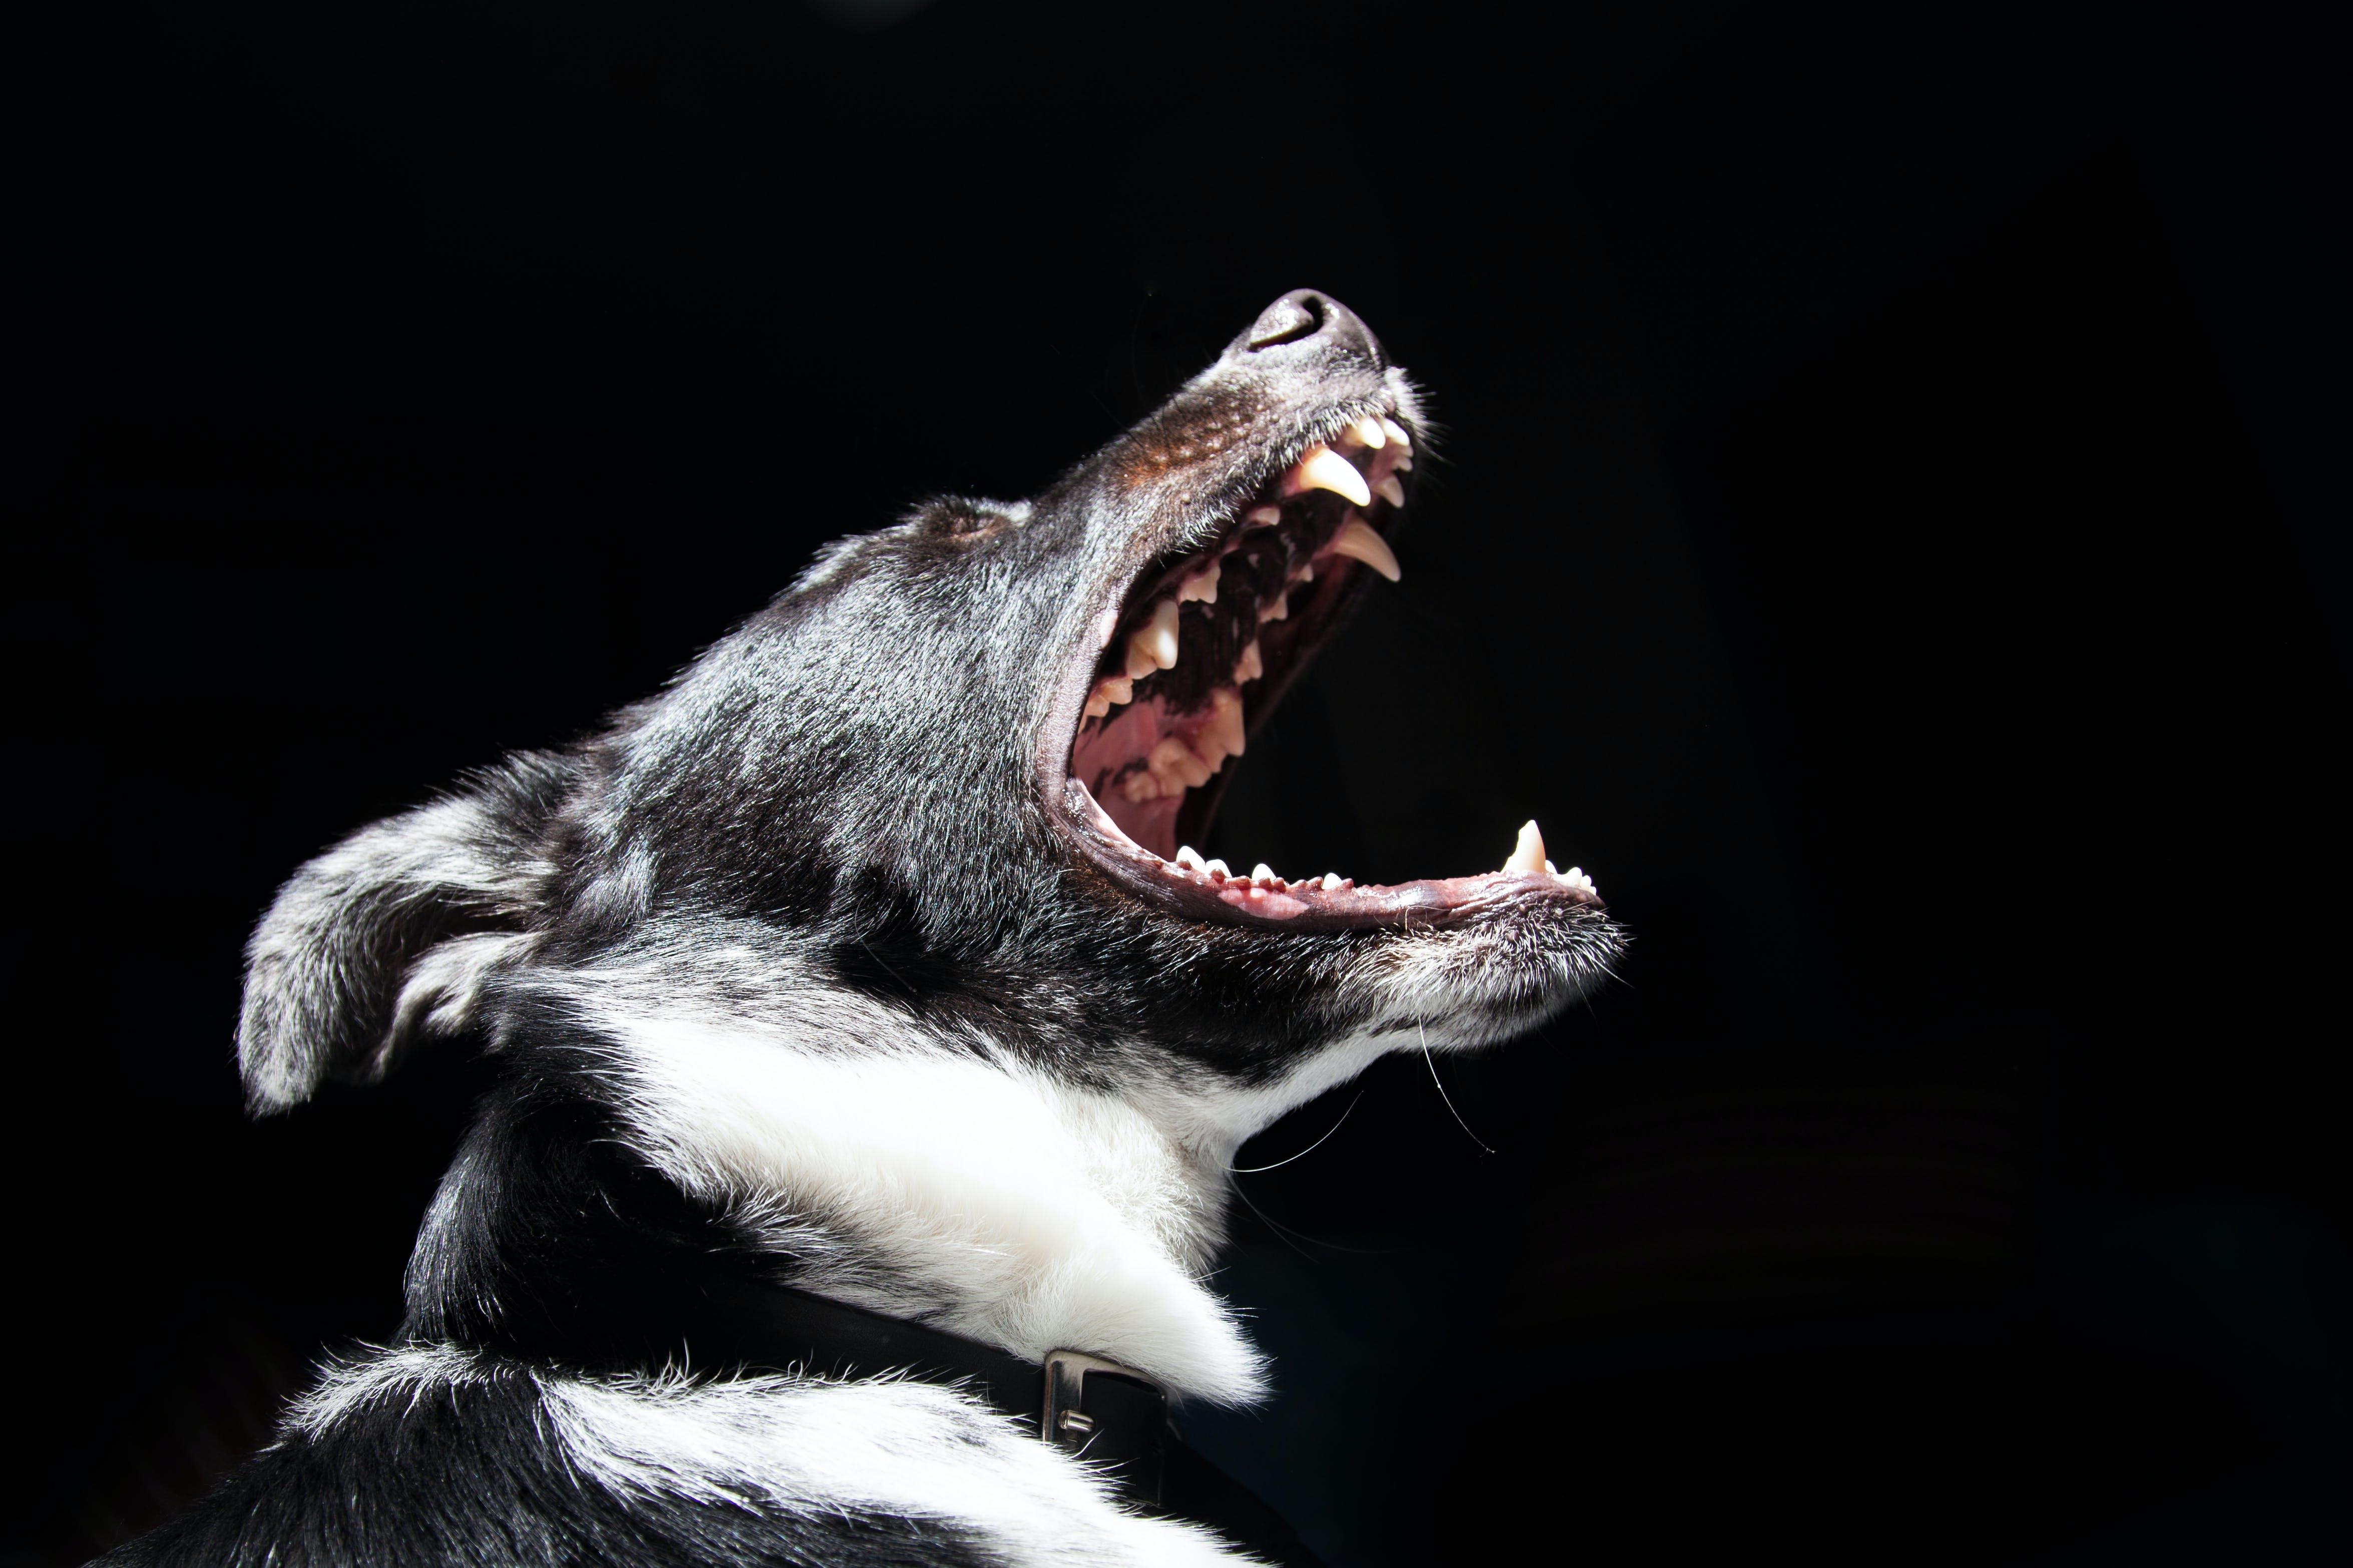 Free stock photo of animal, dog, pet, dangerous